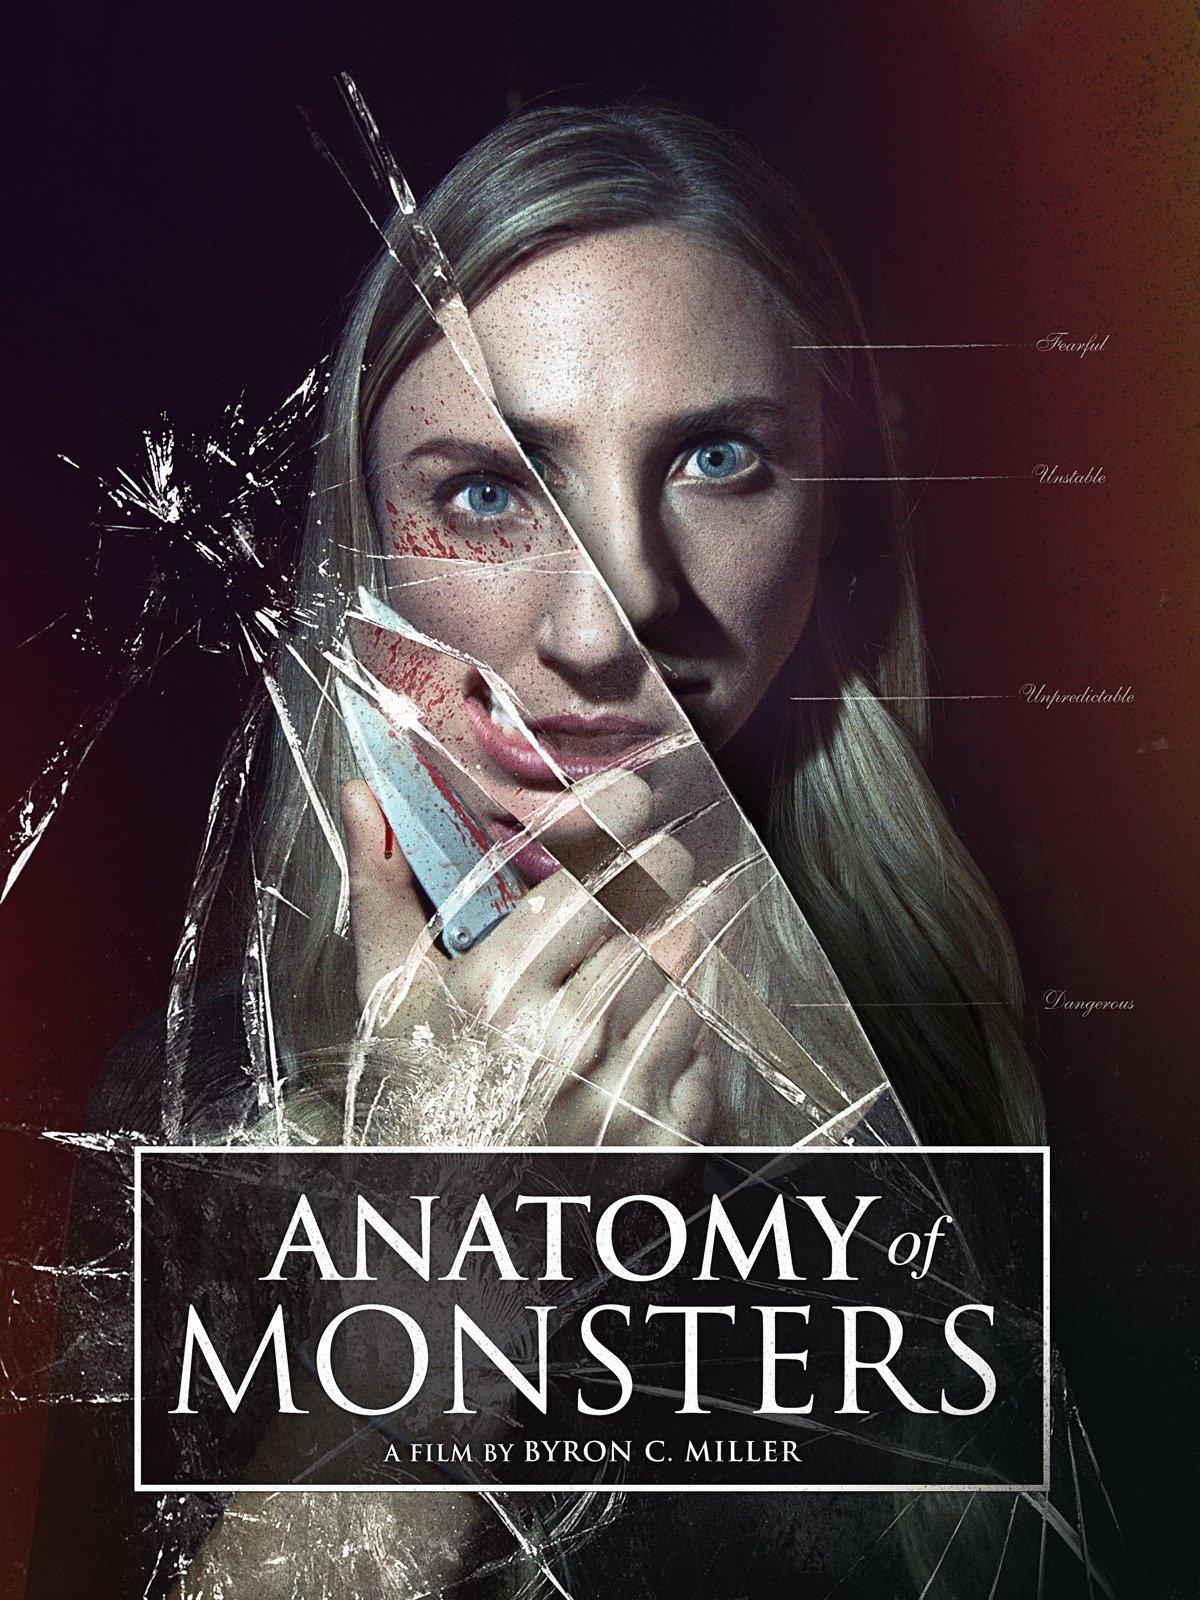 Amazon.com: The Anatomy of Monsters: Tabitha Bastien, Jesse Lee ...